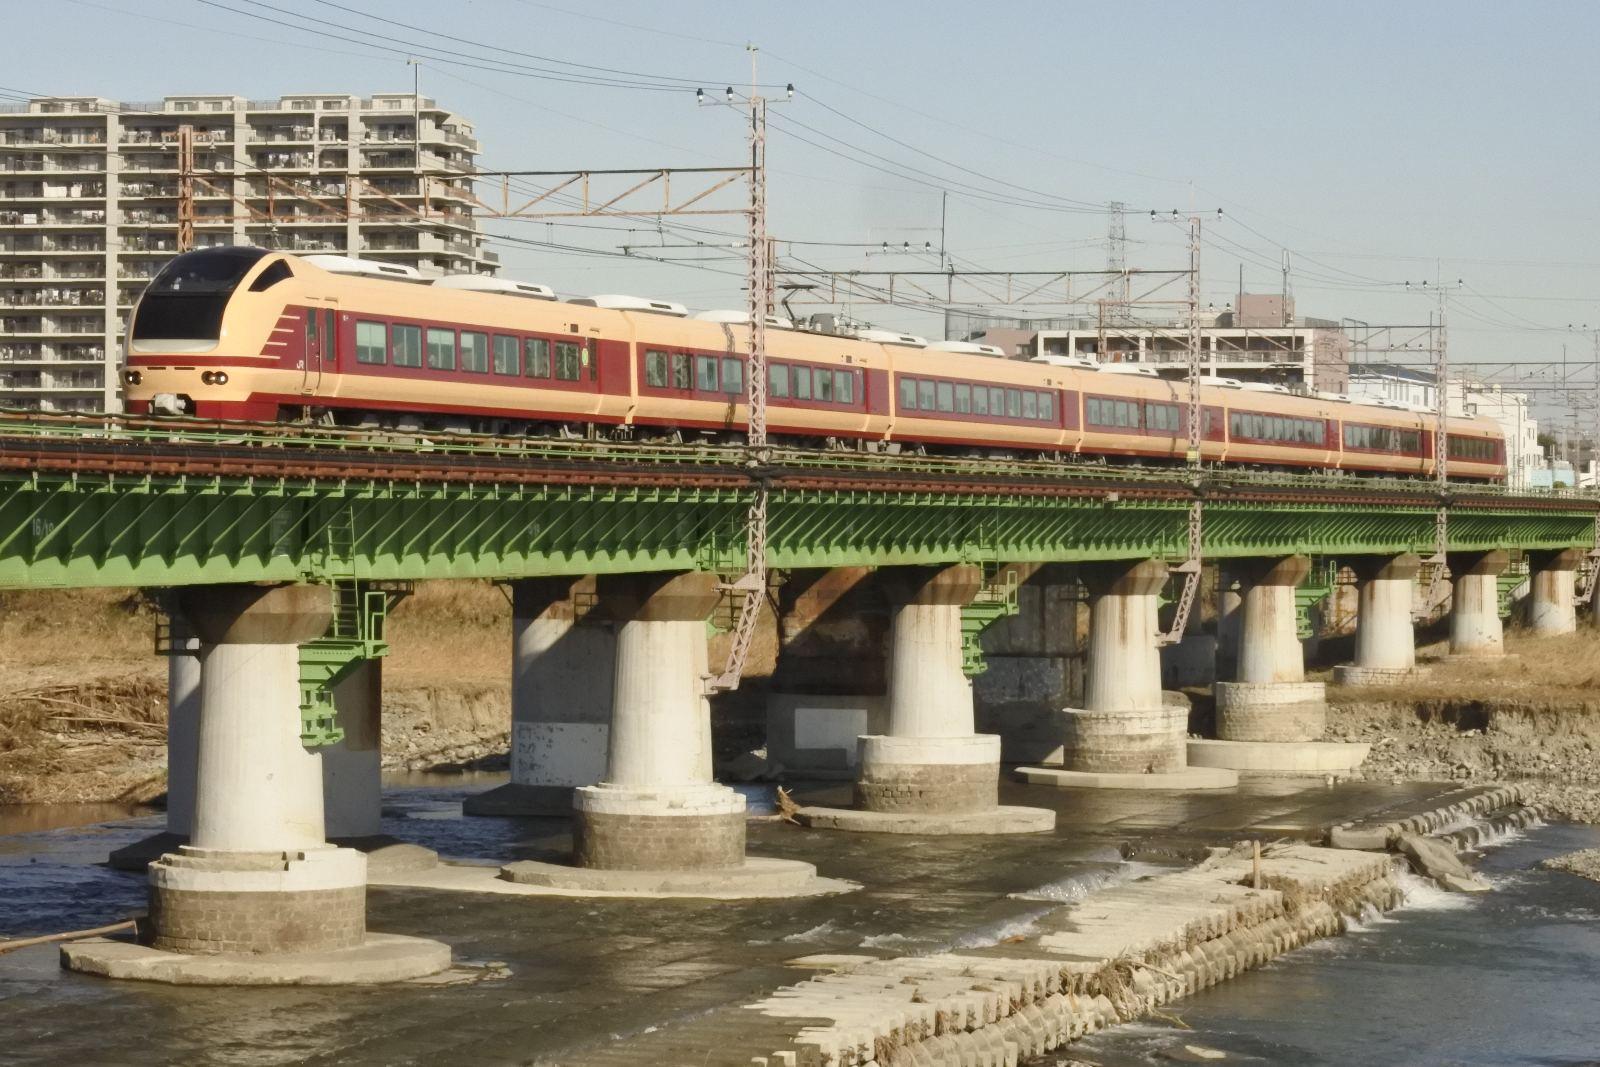 E653系国鉄特急色を撮る | 花見友紀の「鉄道のある日常」 - 楽天ブログ